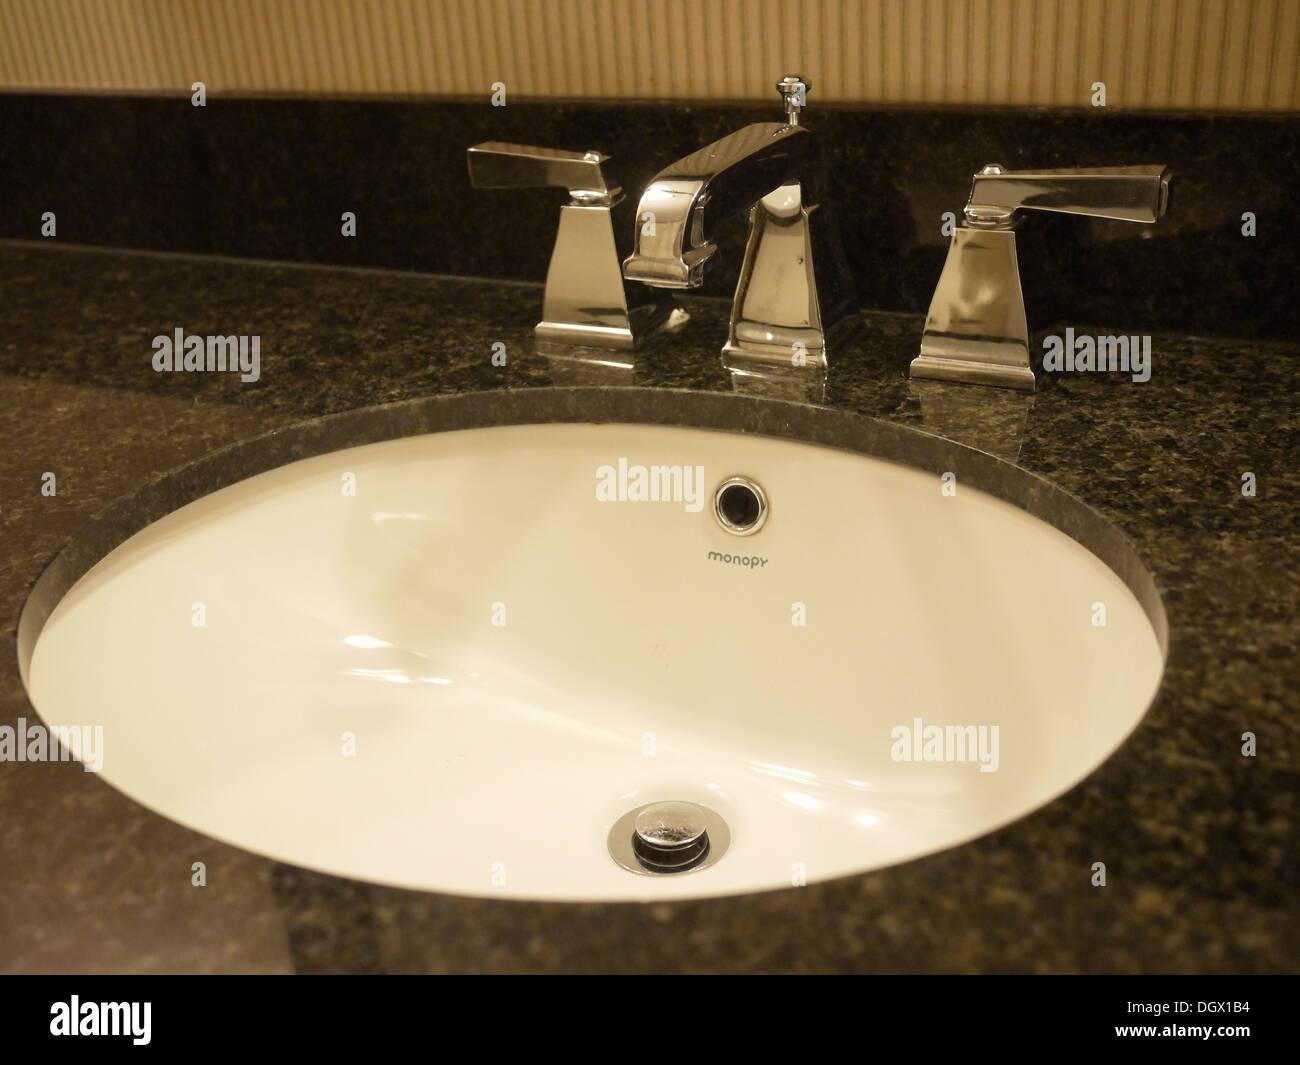 hotel hand wash sink - Stock Image